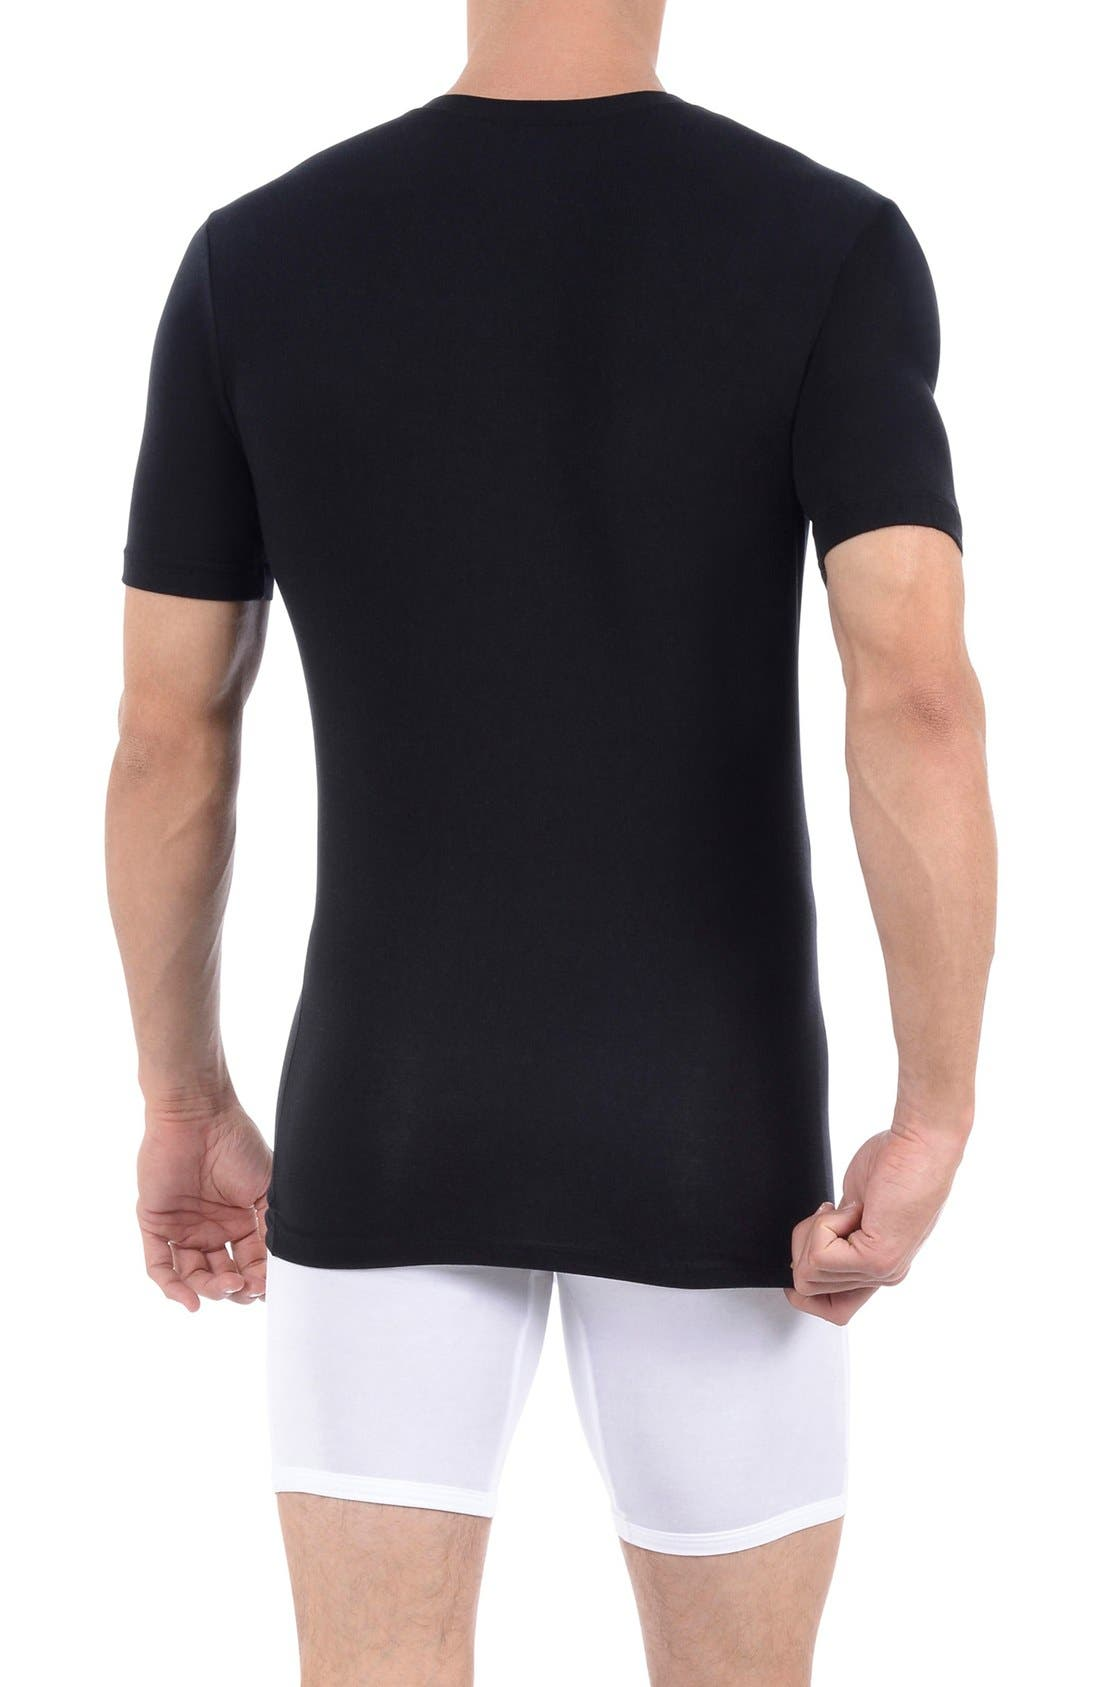 Alternate Image 2  - Tommy John 'Cool Cotton' Deep V-Neck Undershirt